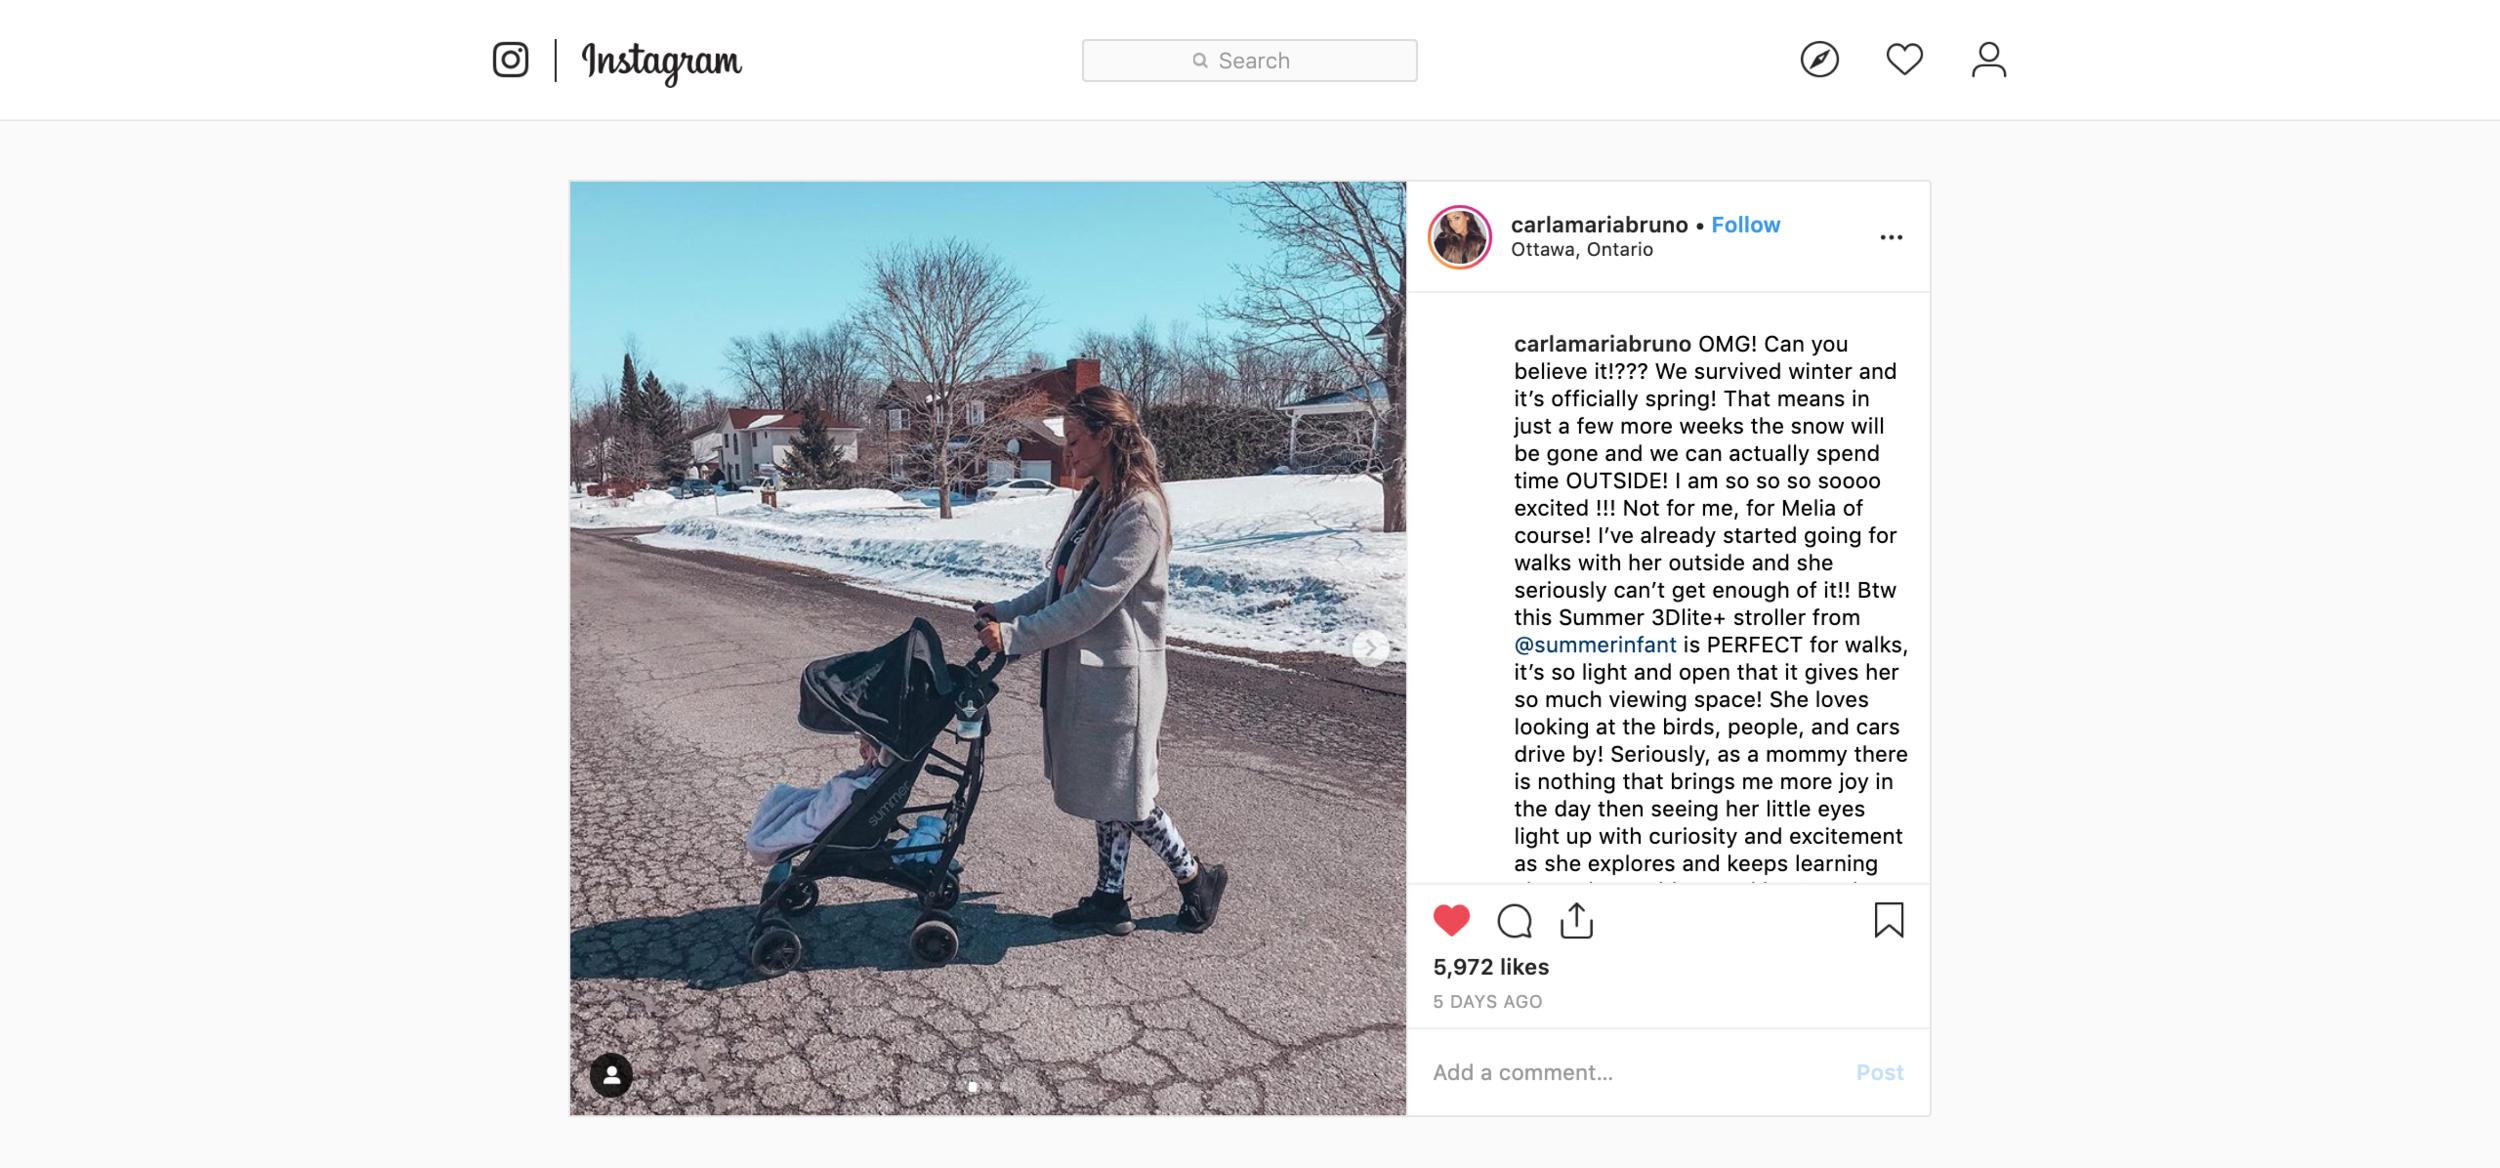 2019.03.26_carlamariabruno, Instagram_Summer 3Dlite+.png